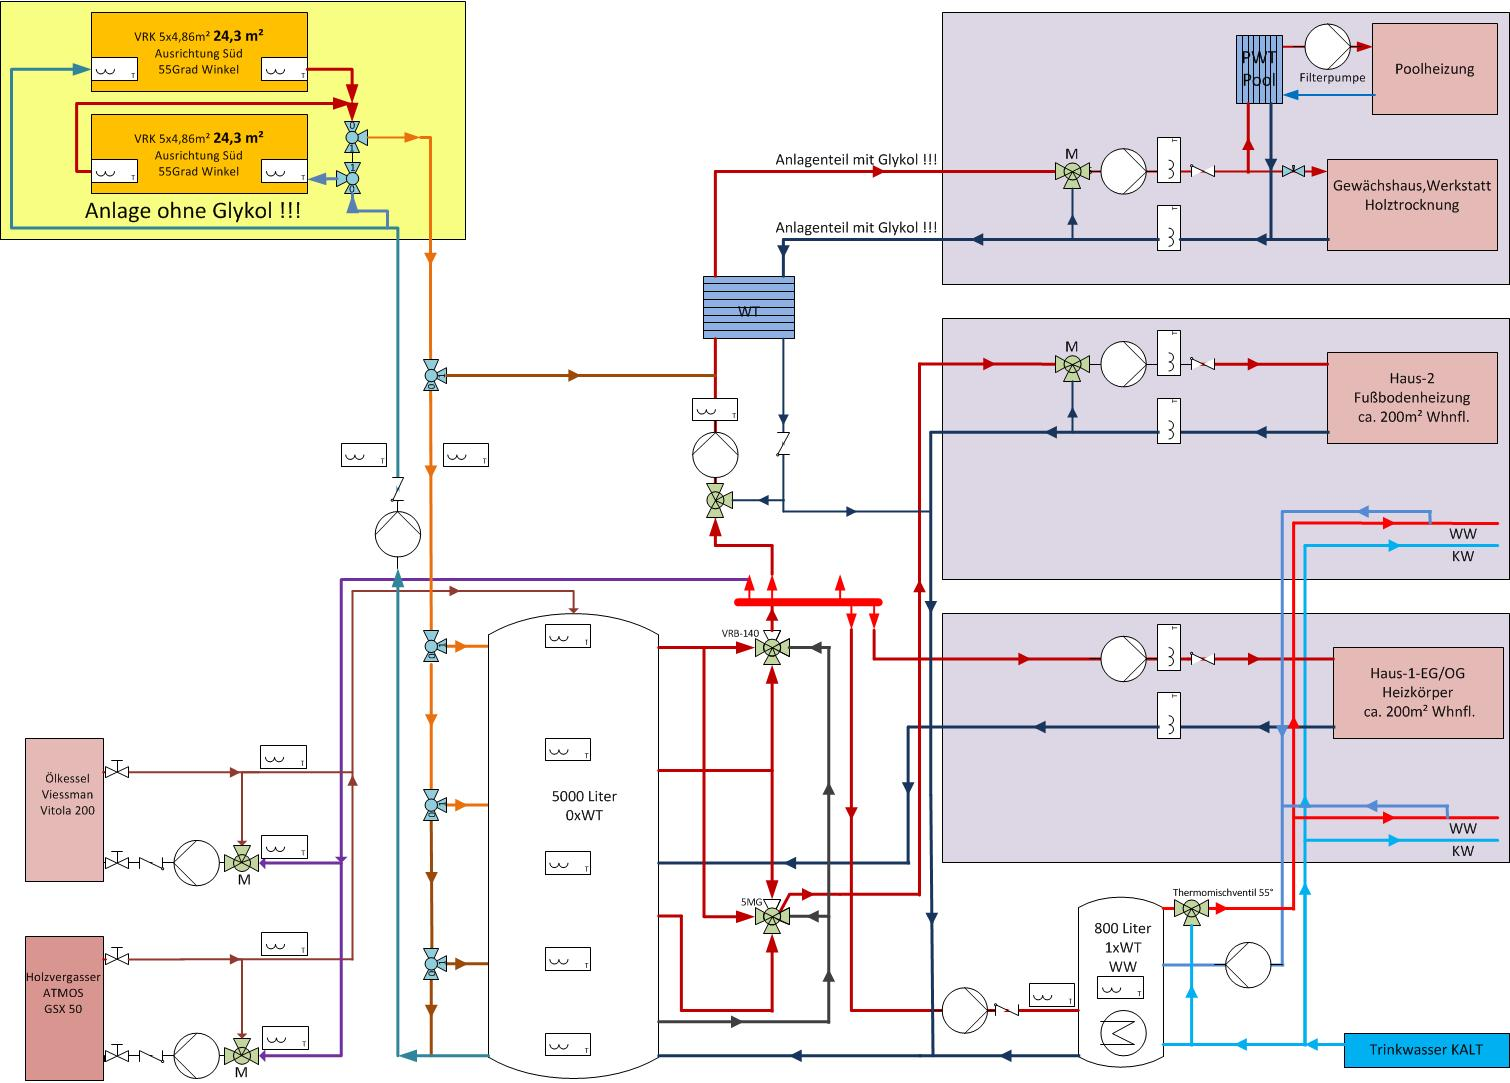 Hydraulikschema 48m² VRK 7000 Liter Puffer - HaustechnikDialog